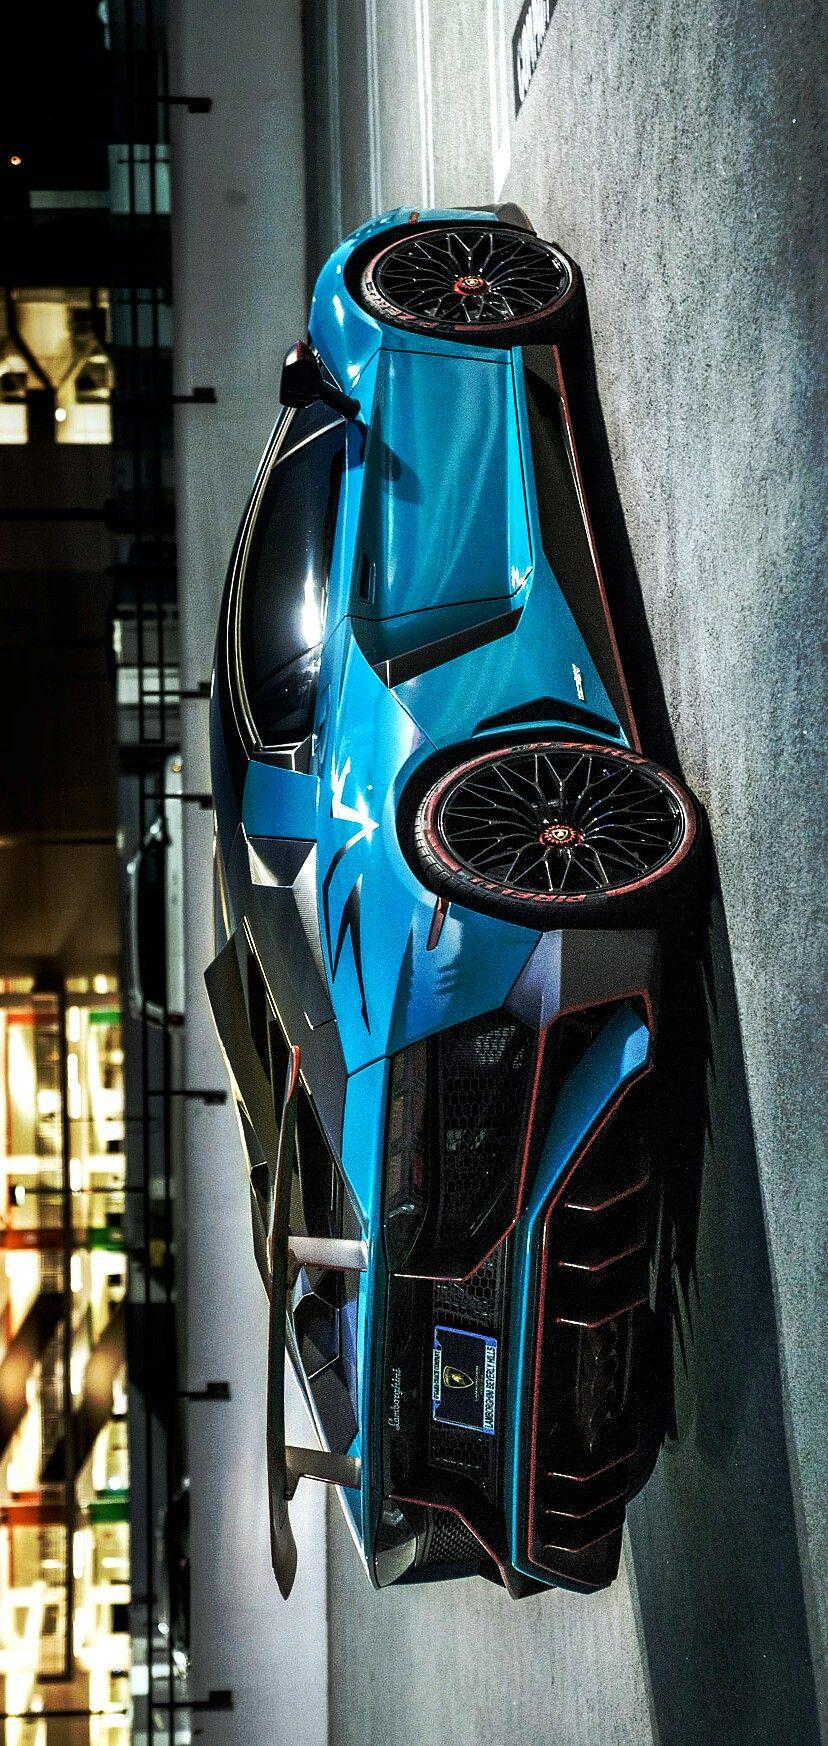 Lamborghini Aventador Superveloce Lp750 4 Car Pinterest Fuerte